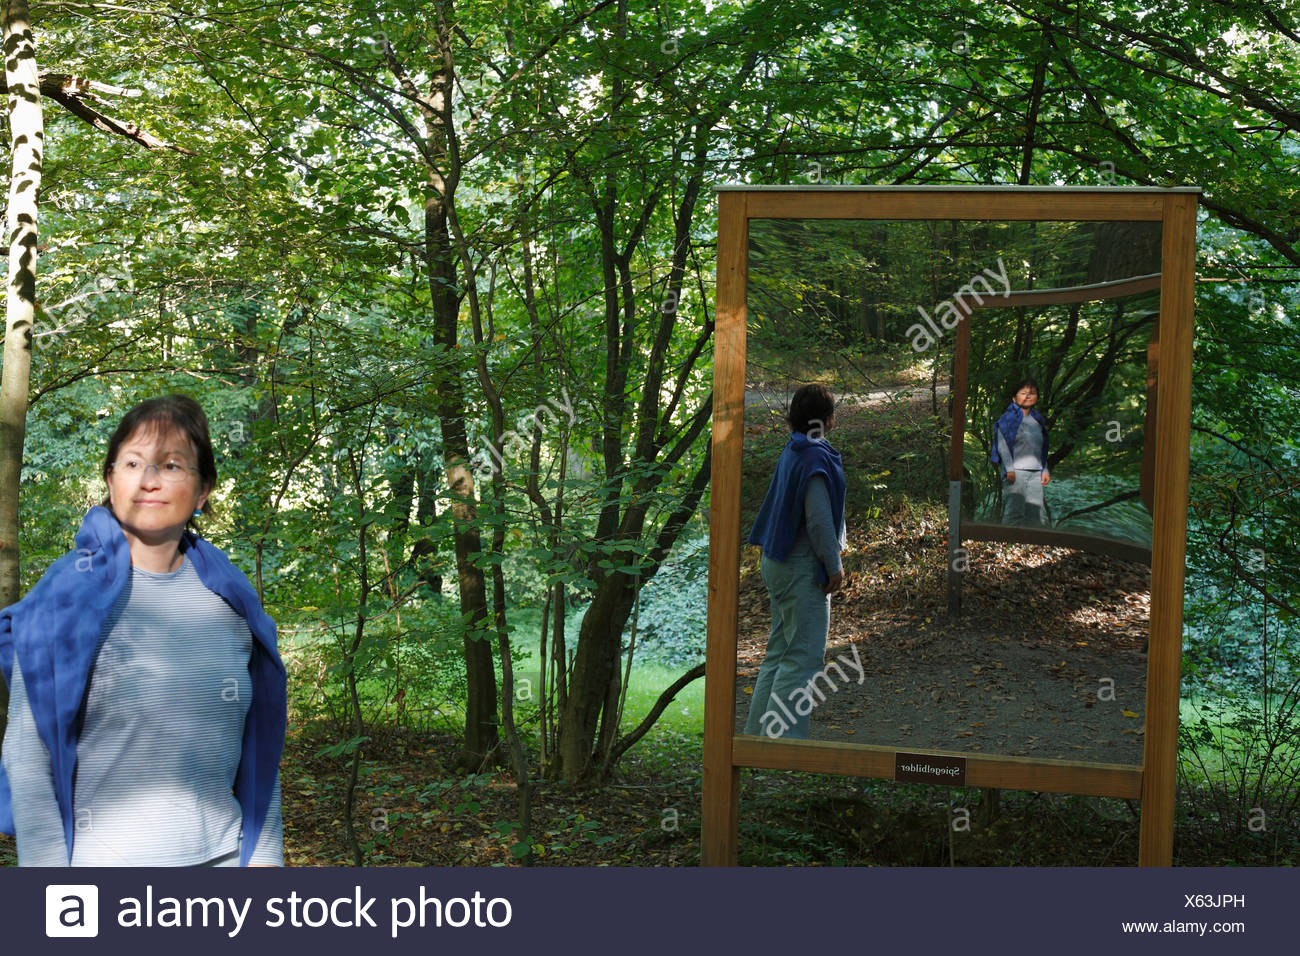 Le immagini mirror Weg der Besinnung (titolo di riflessi), Bad Kissingen, Rhoen, Franconia, Germania Immagini Stock